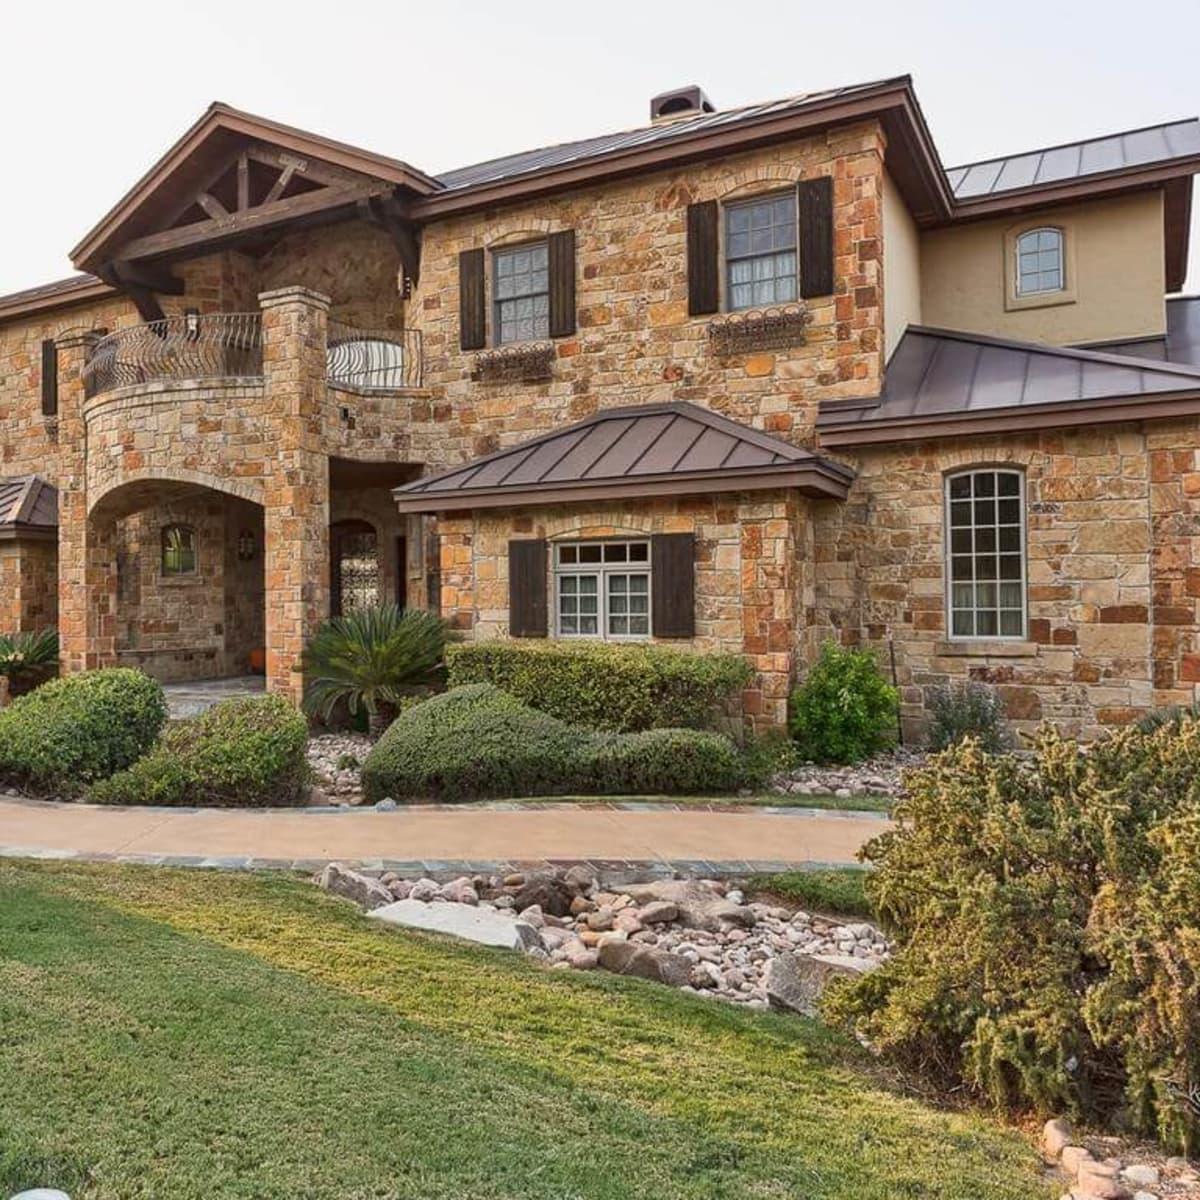 Austin home house 12006 Pleasant Panorama View 78738 Jeff Kent April 2016 front exterior